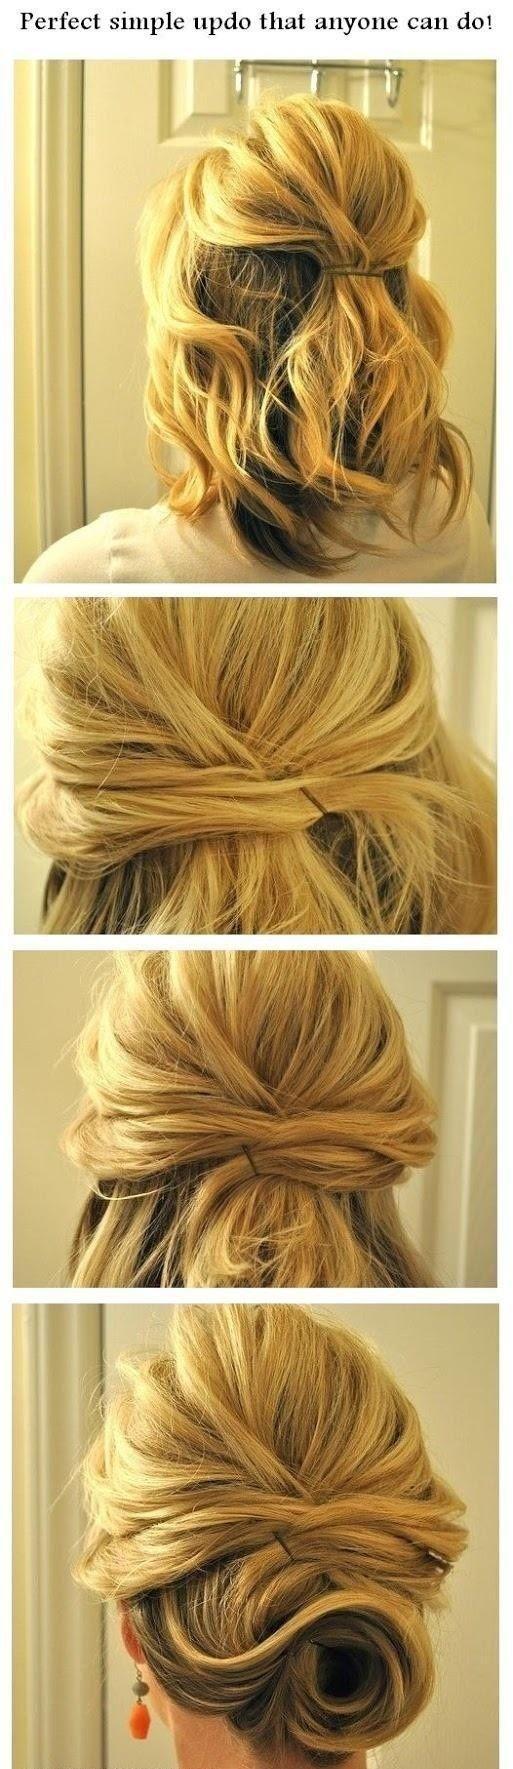 Enjoyable 15 Cute Easy Hairstyle Tutorials For Medium Length Hair Gurl Com Short Hairstyles Gunalazisus